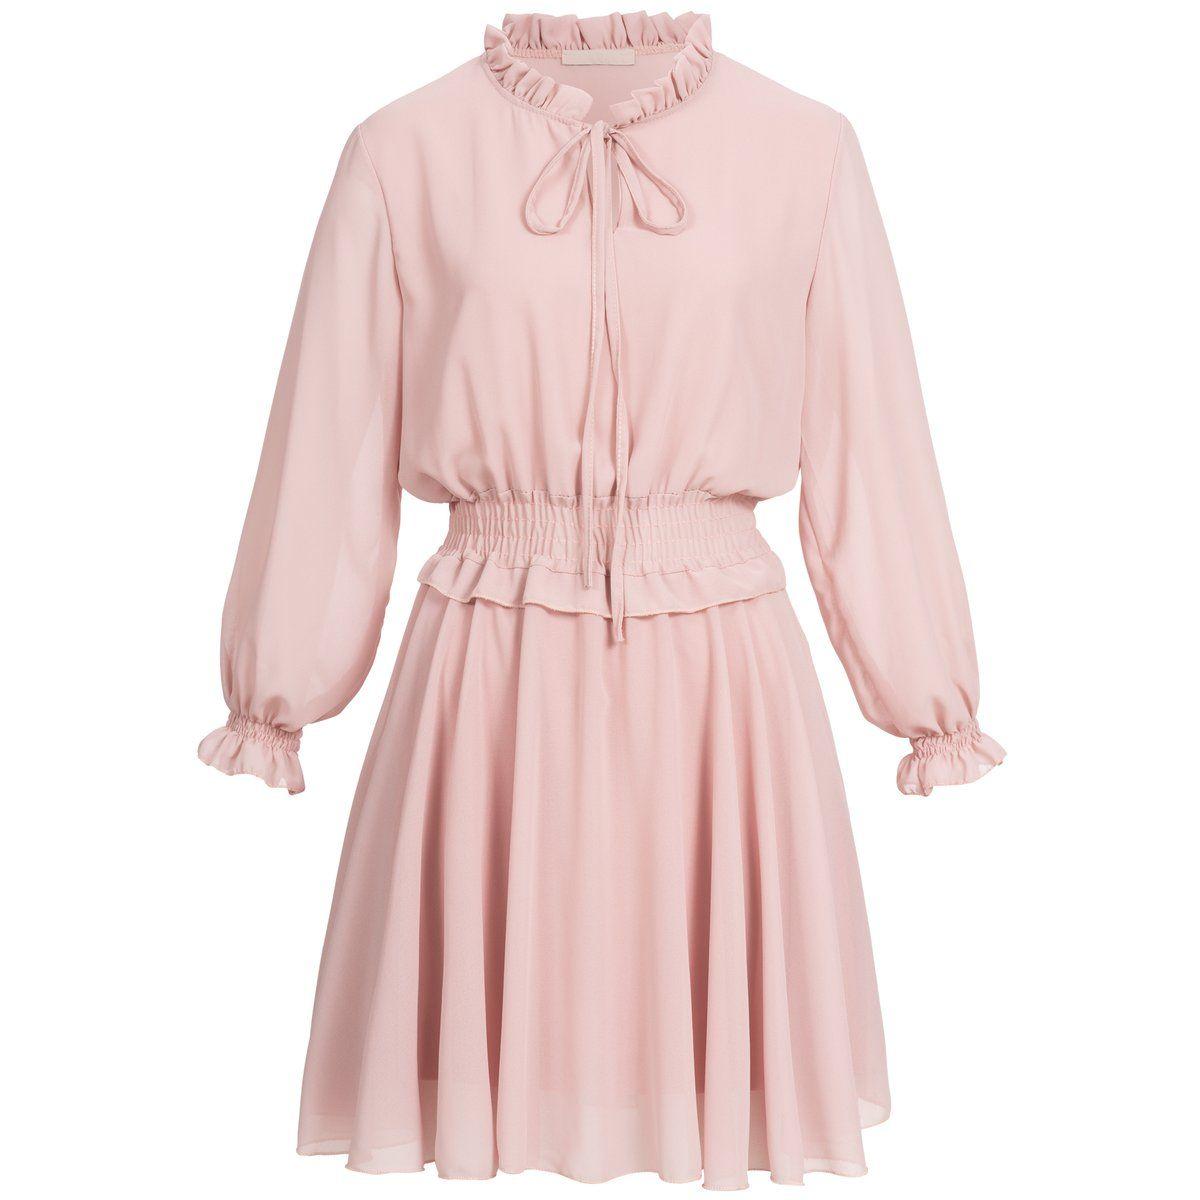 Linda Dress  Kleider, Langärmelige kleider, Modestil